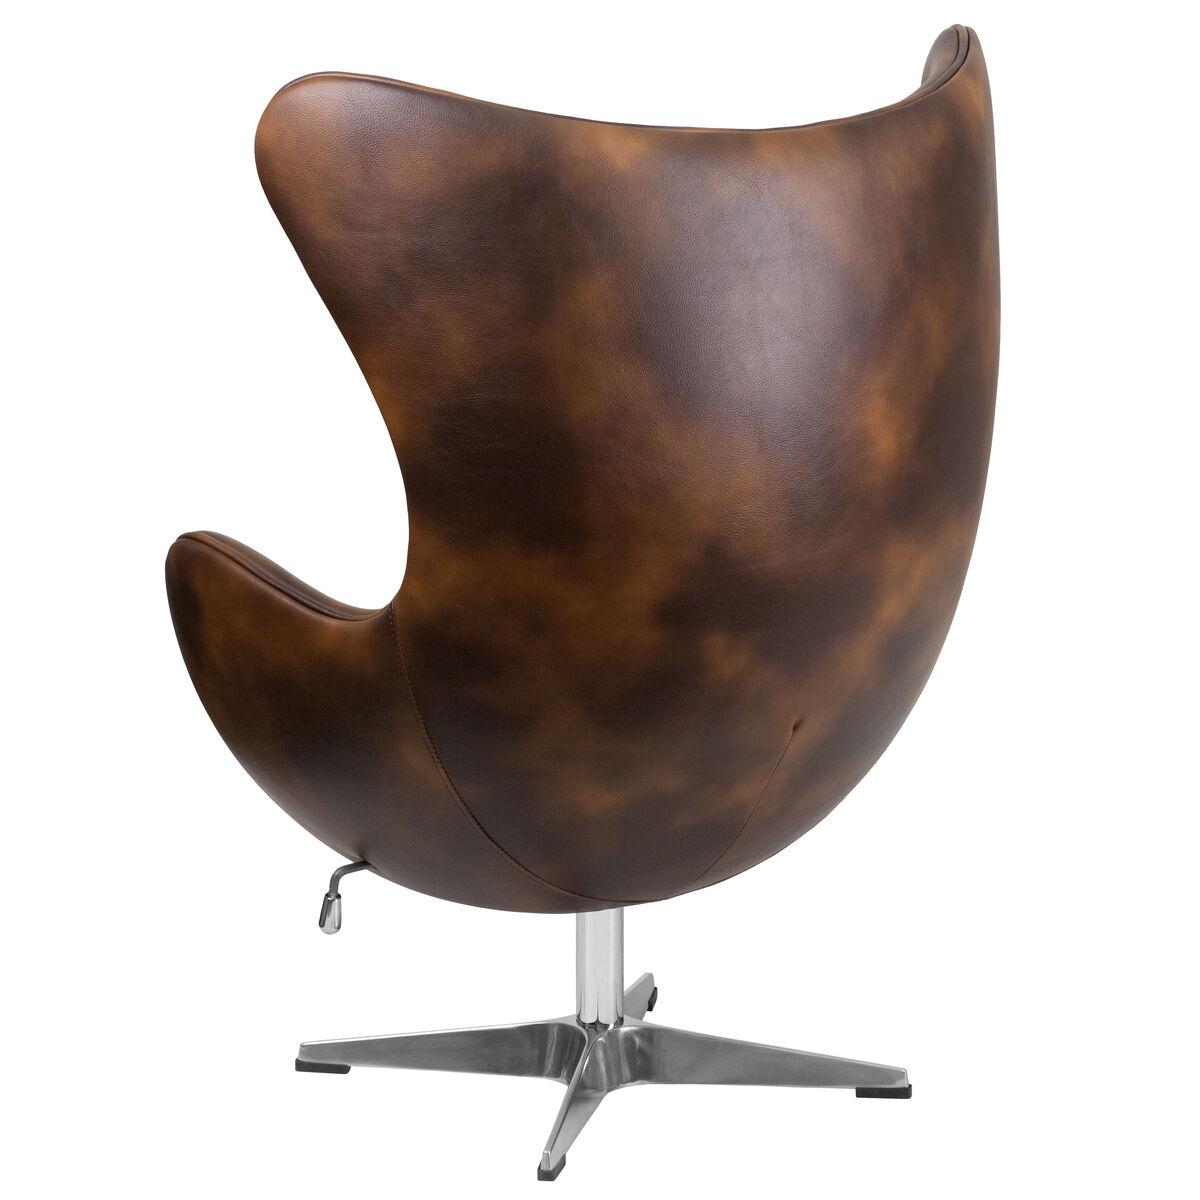 Amazing Bomber Jacket Leather Egg Chair With Tilt Lock Mechanism Ibusinesslaw Wood Chair Design Ideas Ibusinesslaworg